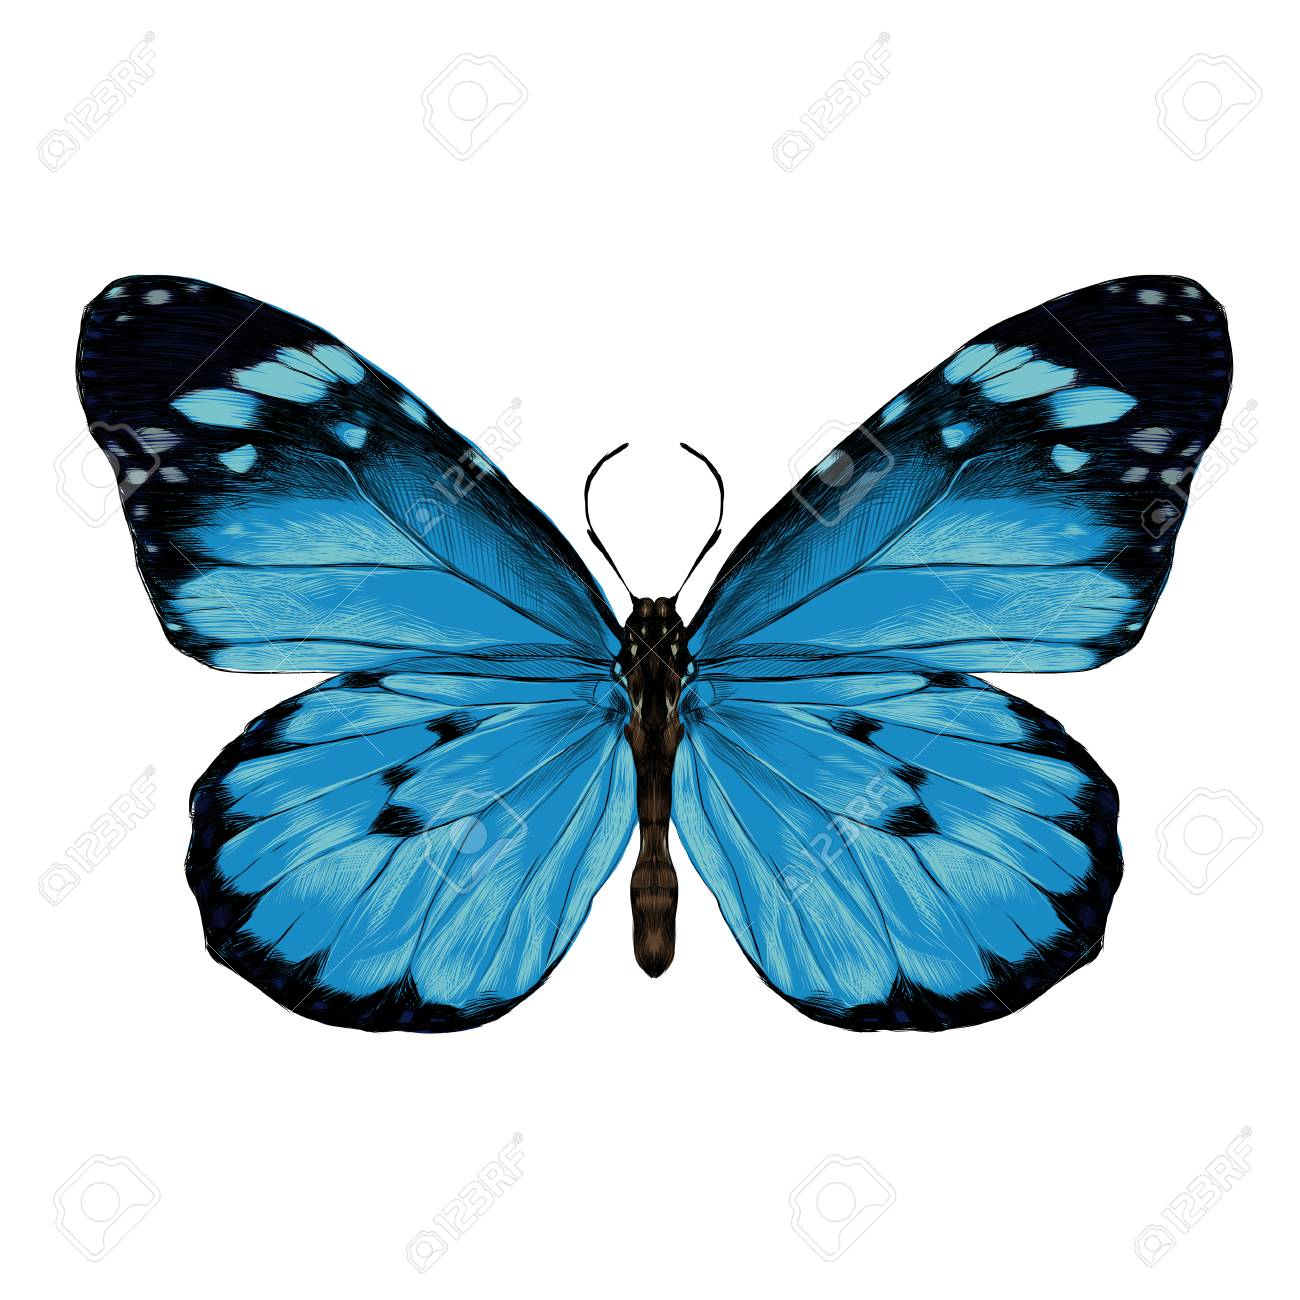 Dibujos Mariposas De Colores. Good Pintar Dibujo Acuarela Mariposa ...